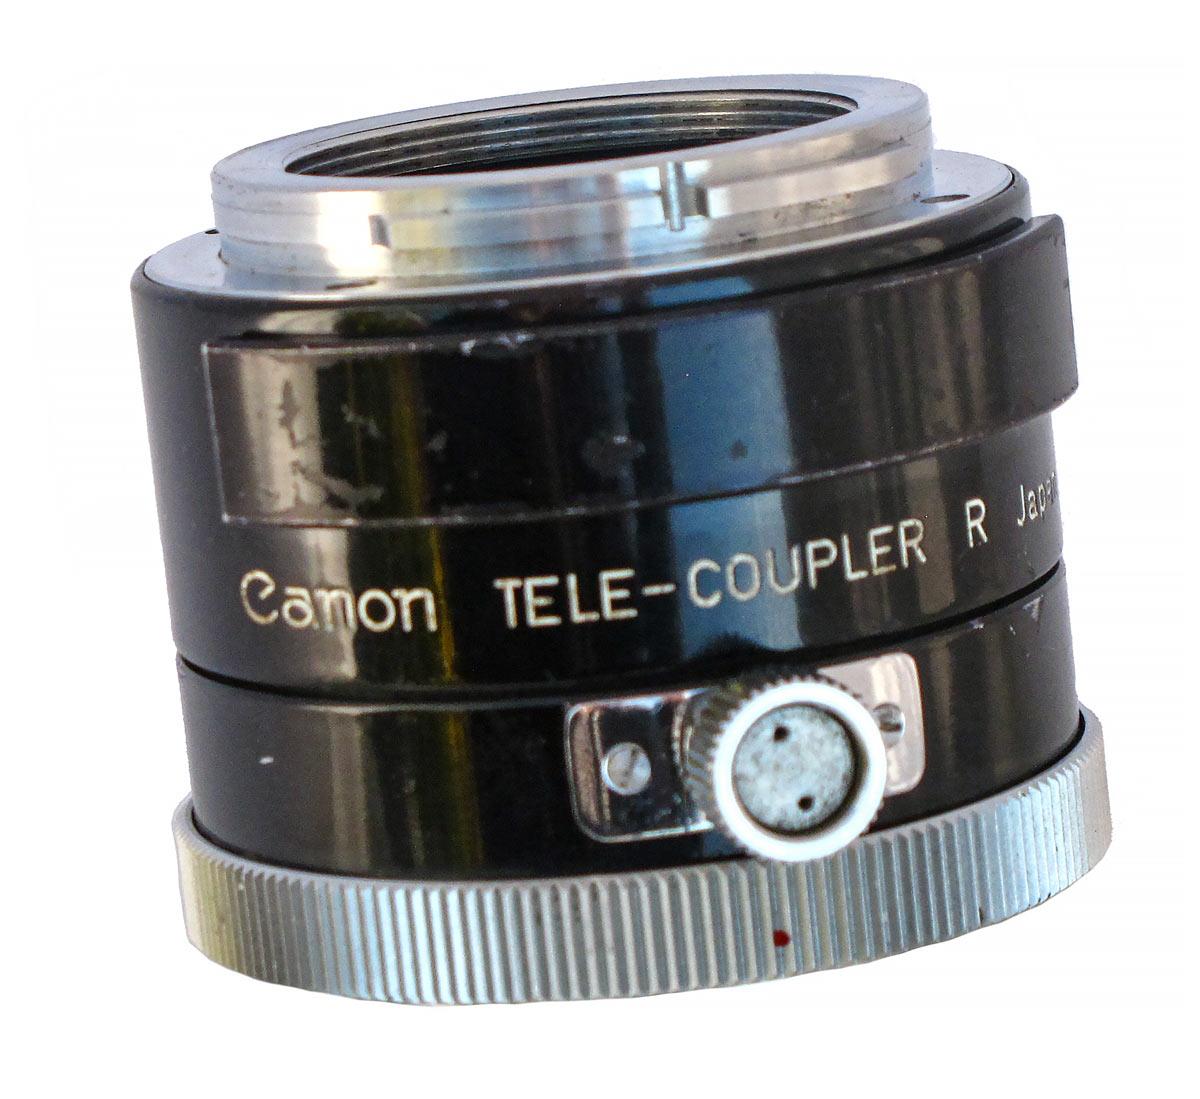 Tele-Coupler R